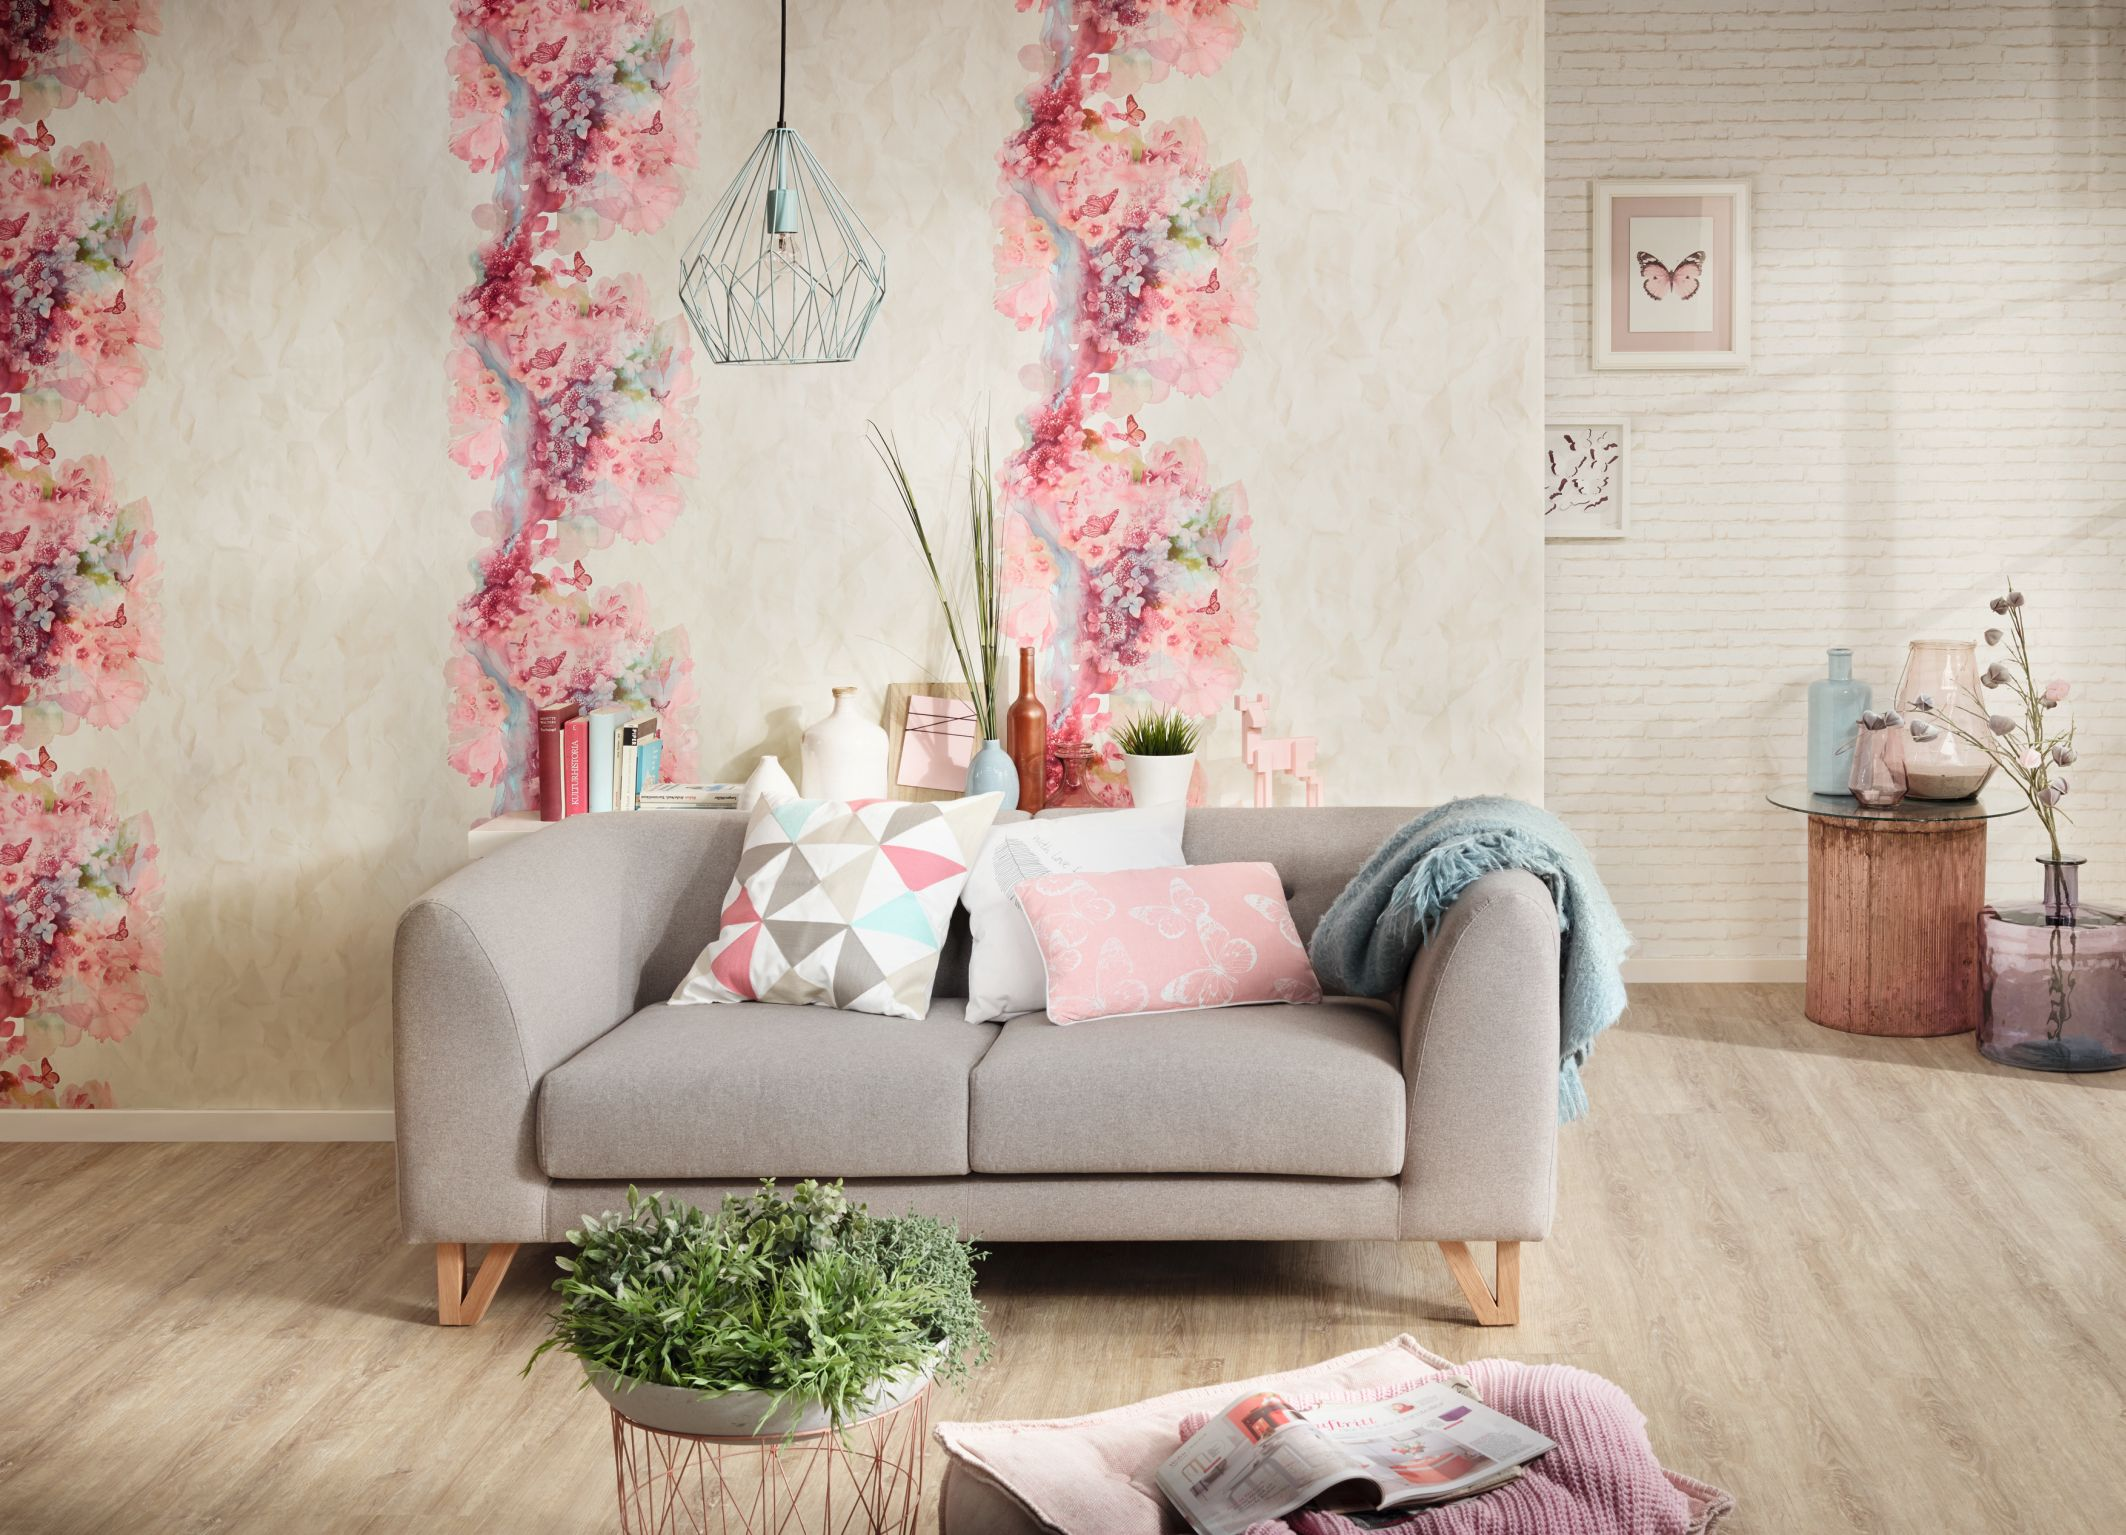 Tapete mit rosa Blumenmuster